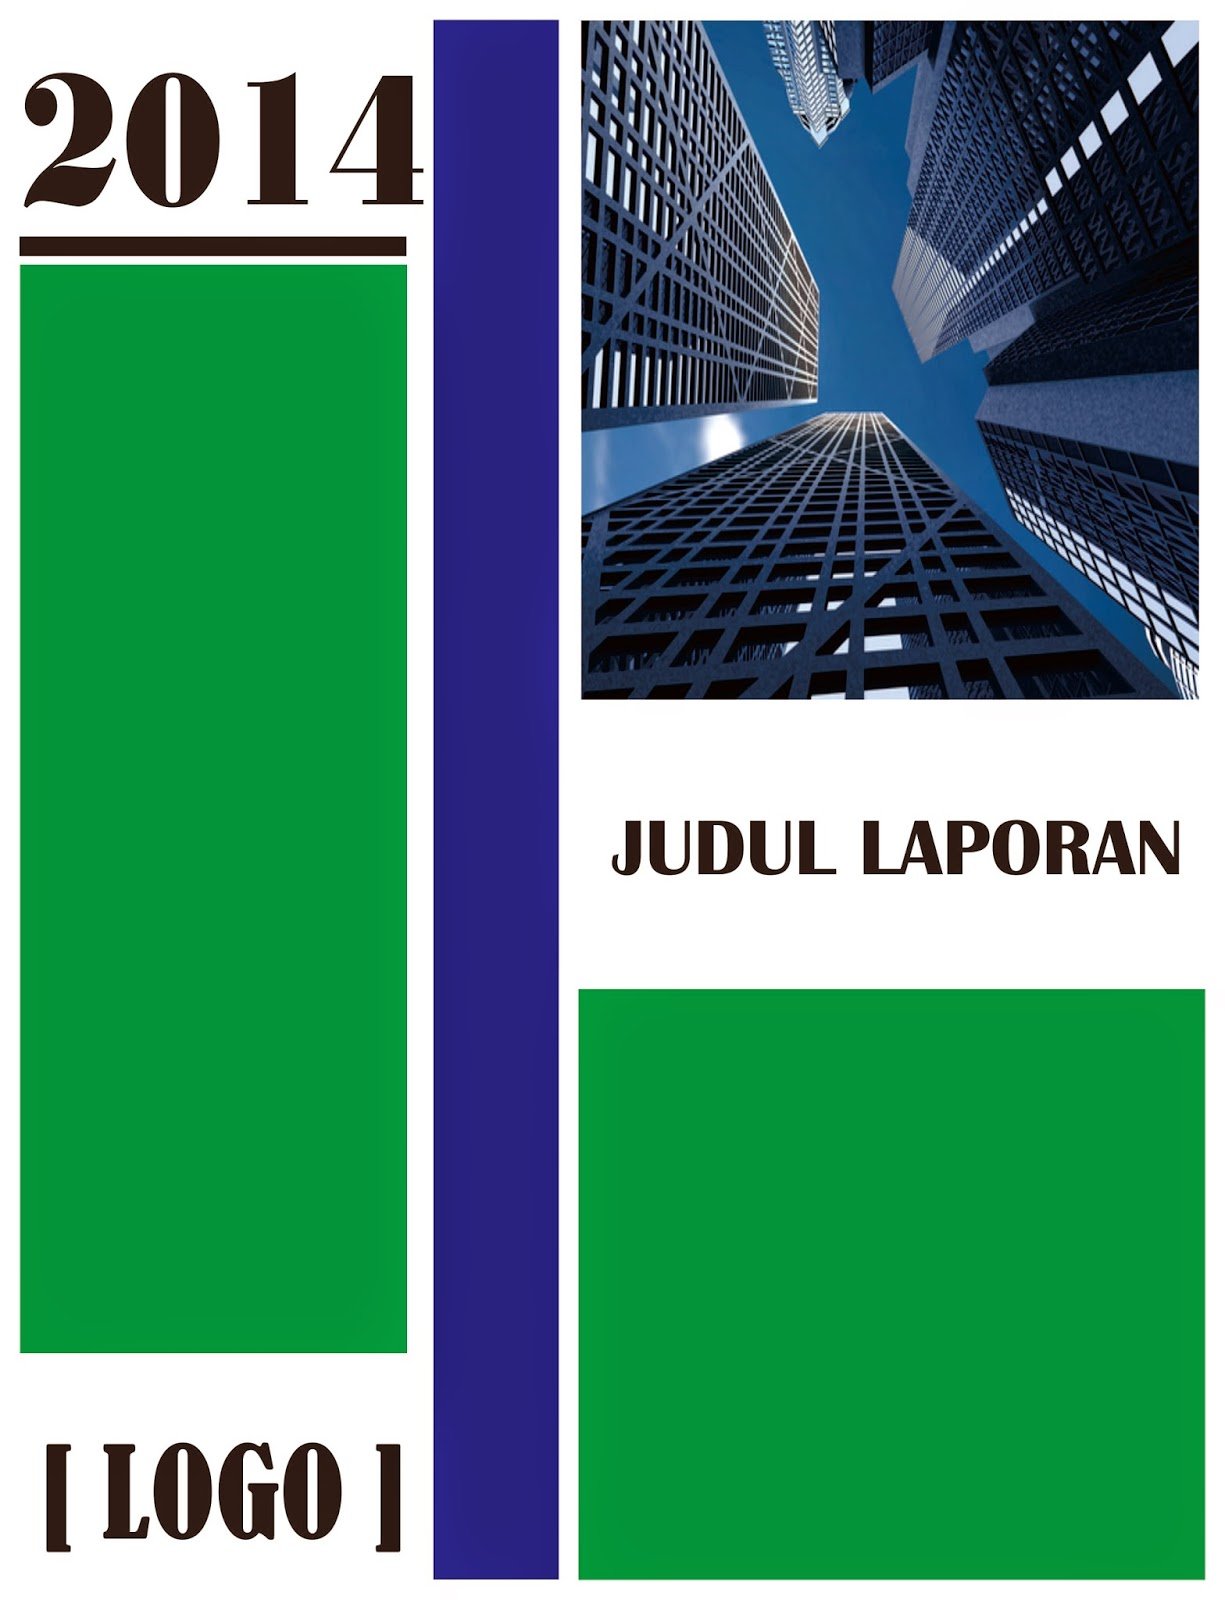 Download Cover Laporan Biru Hijau Download Contoh Cover Laporan